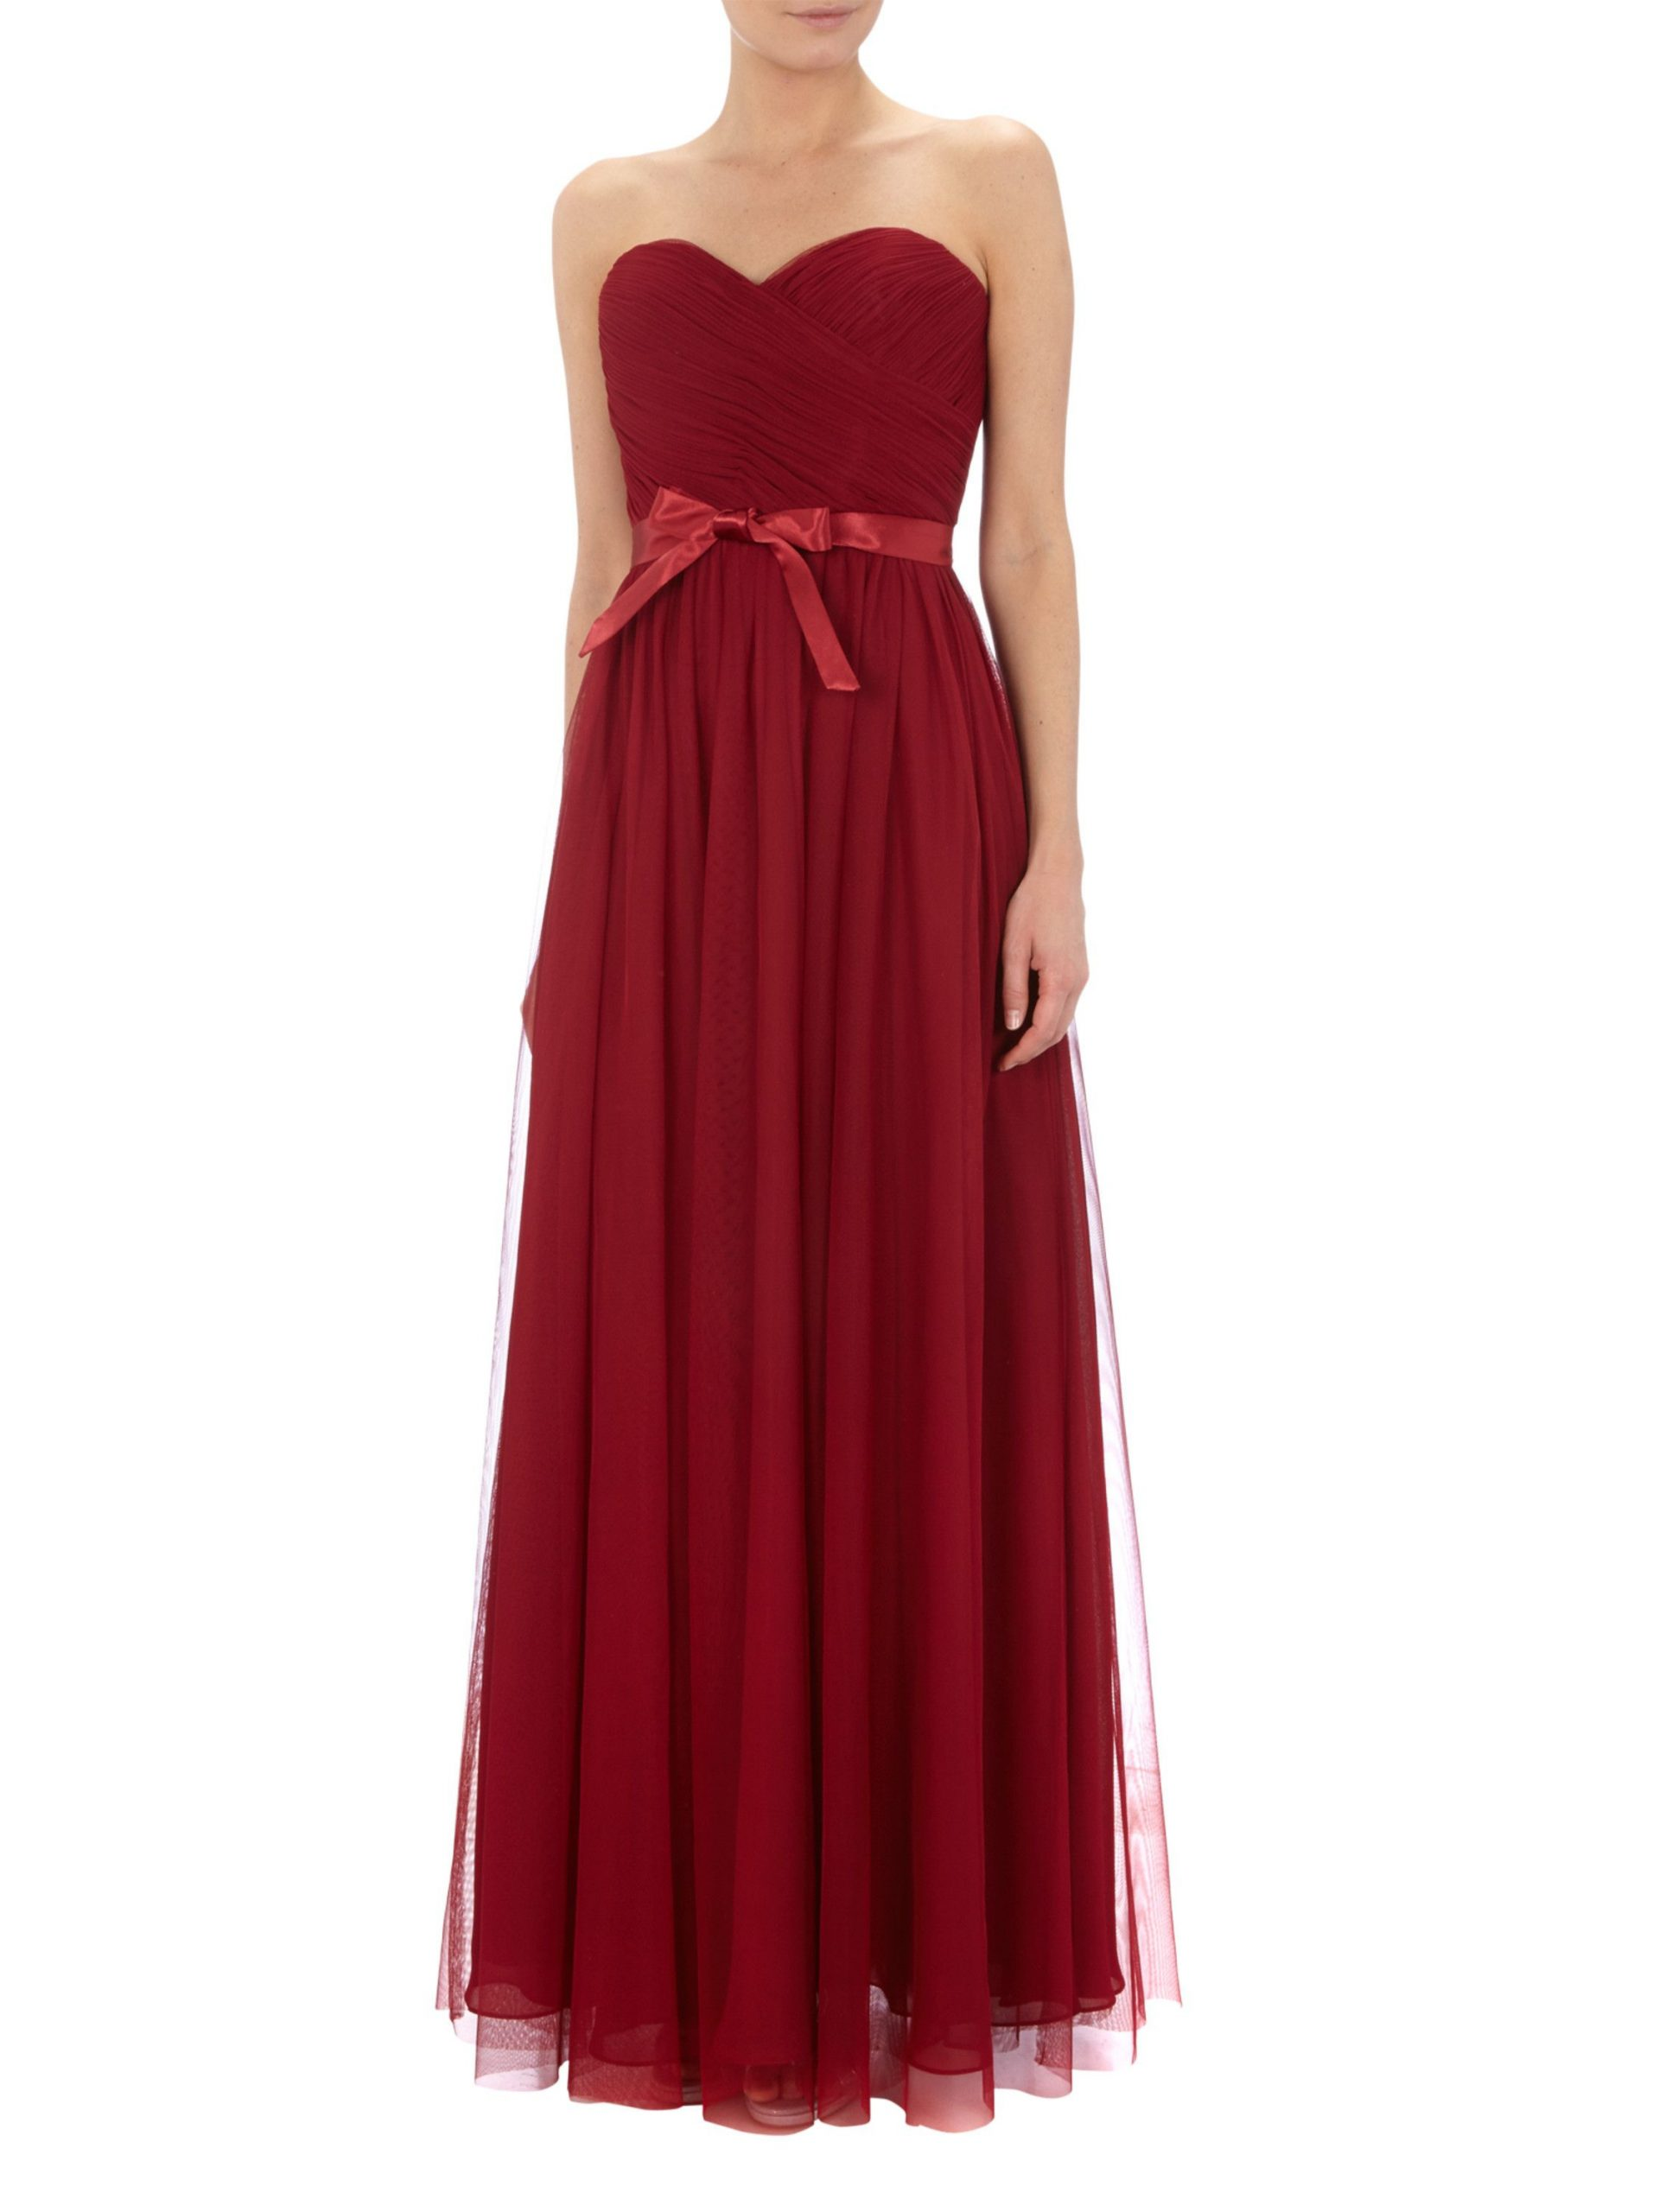 Mascara Kleid Rot  Abendkleider  Elegante Ballkleider